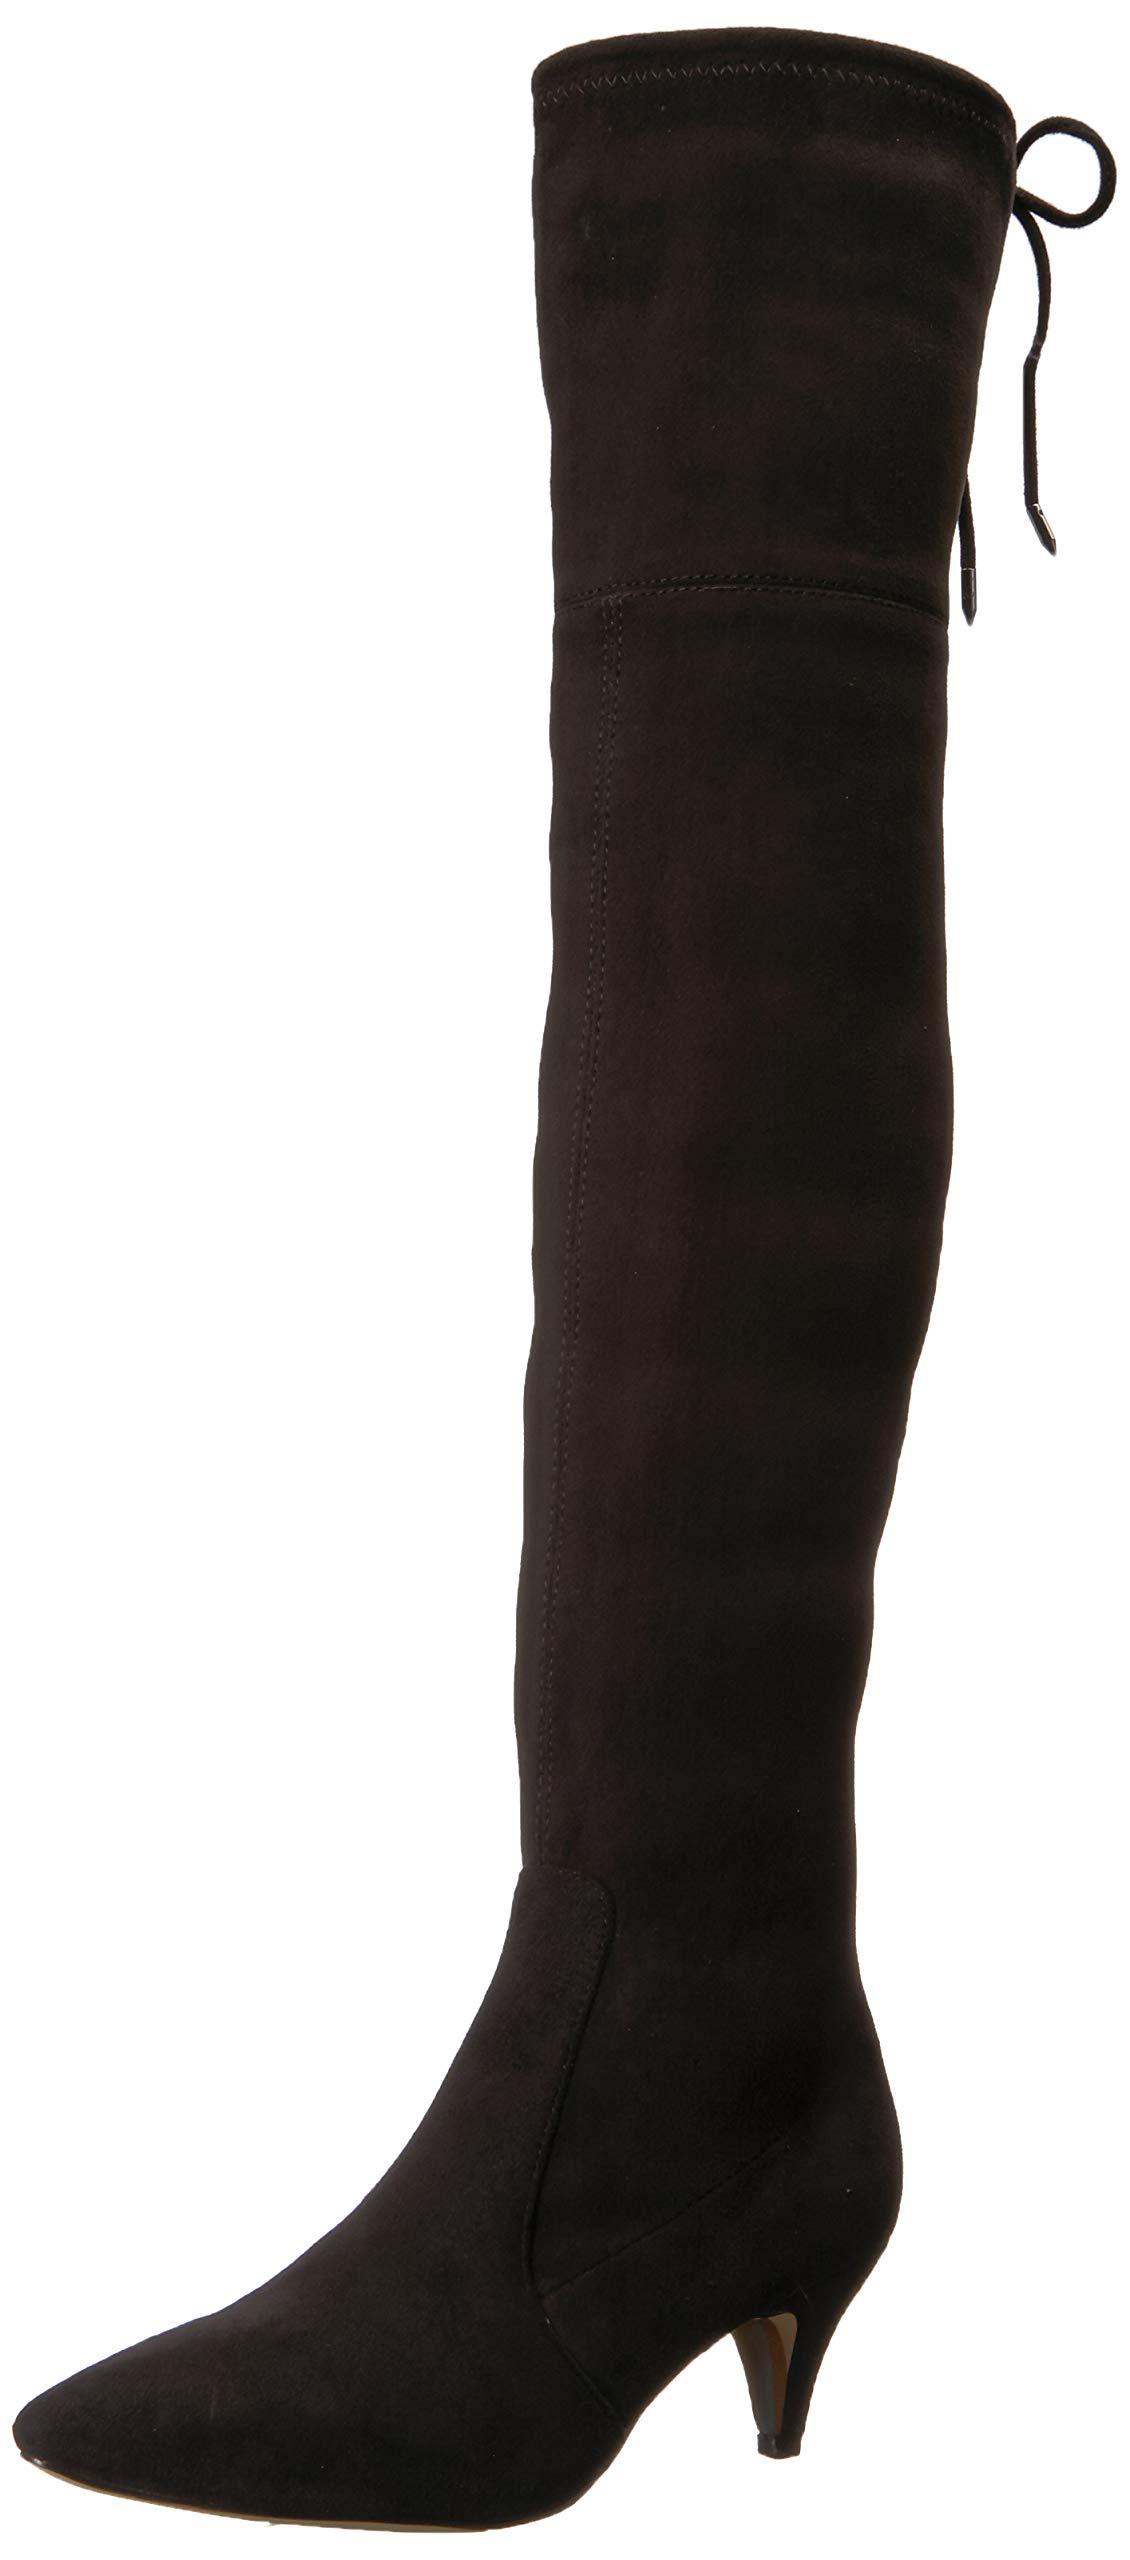 Sam Edelman Women's Kristie Over The Over The Knee Boot, Black, 8 M US by Sam Edelman